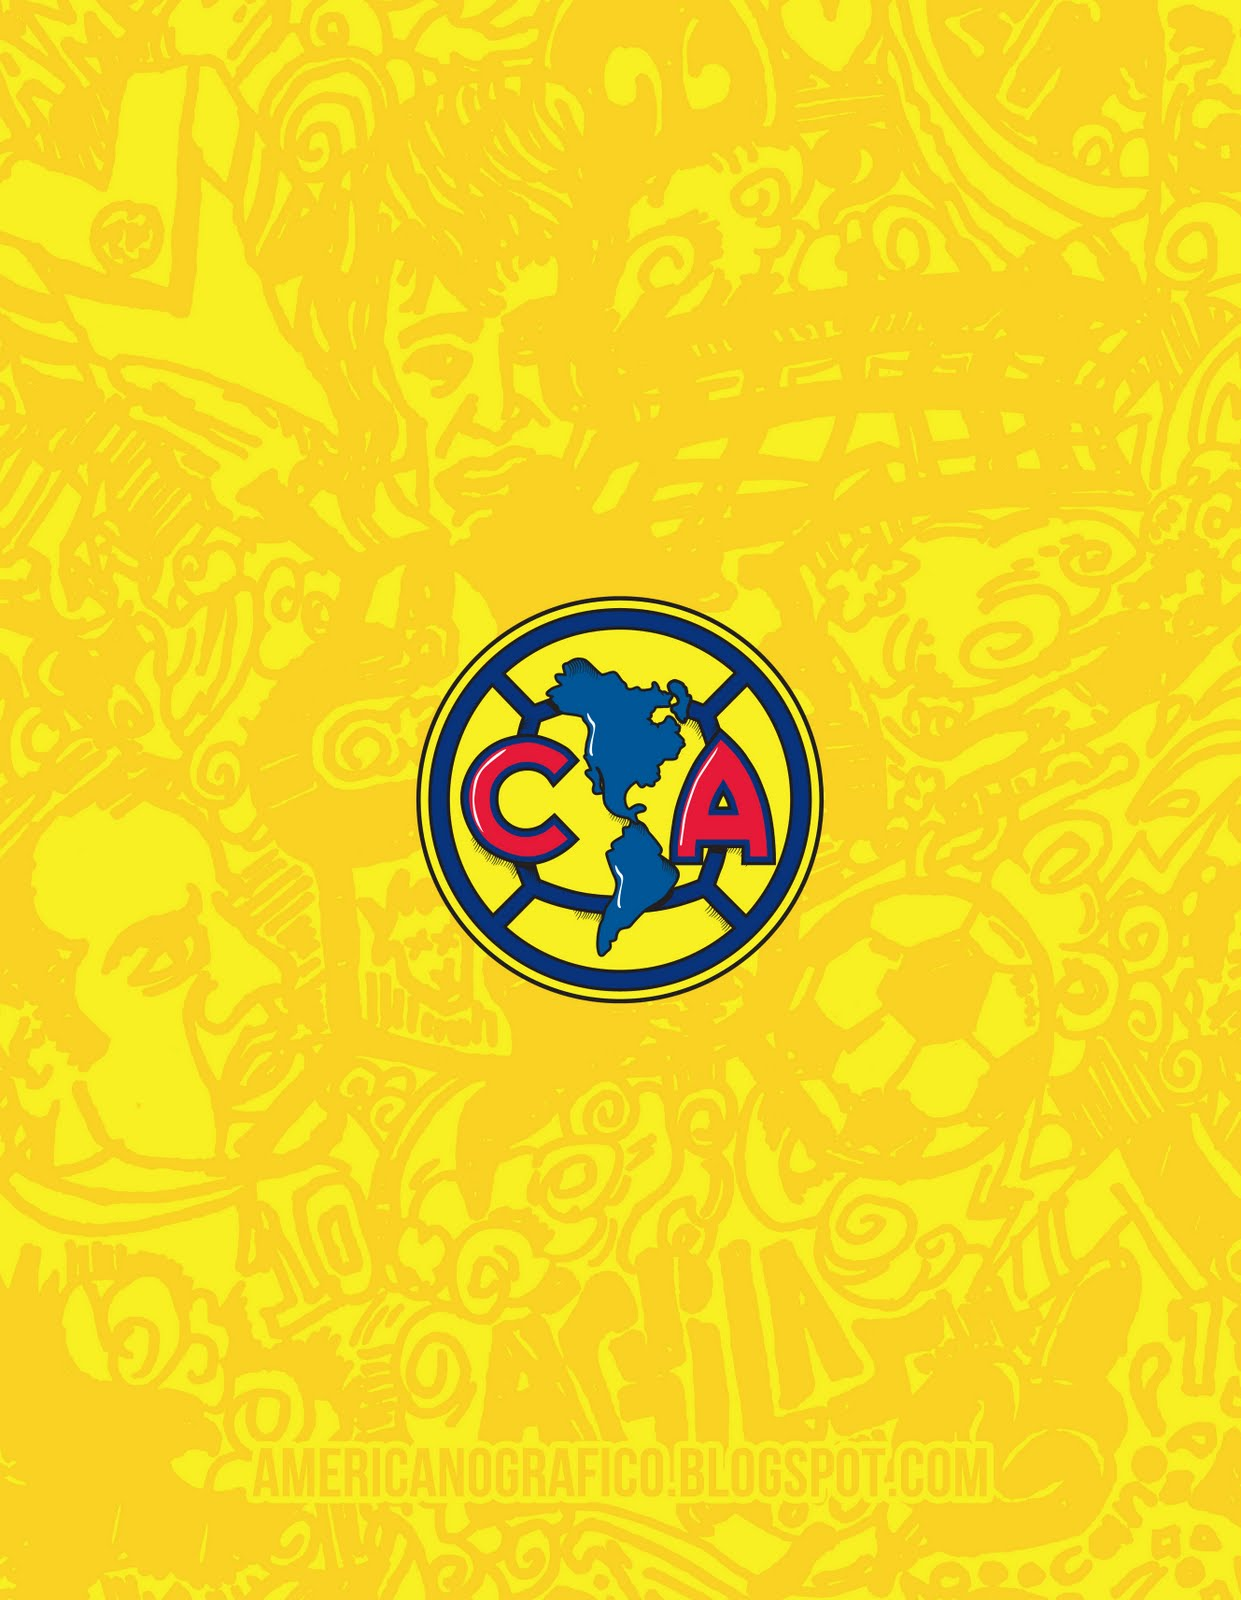 Aguilas del america wallpapers HD   Imagui 1241x1600